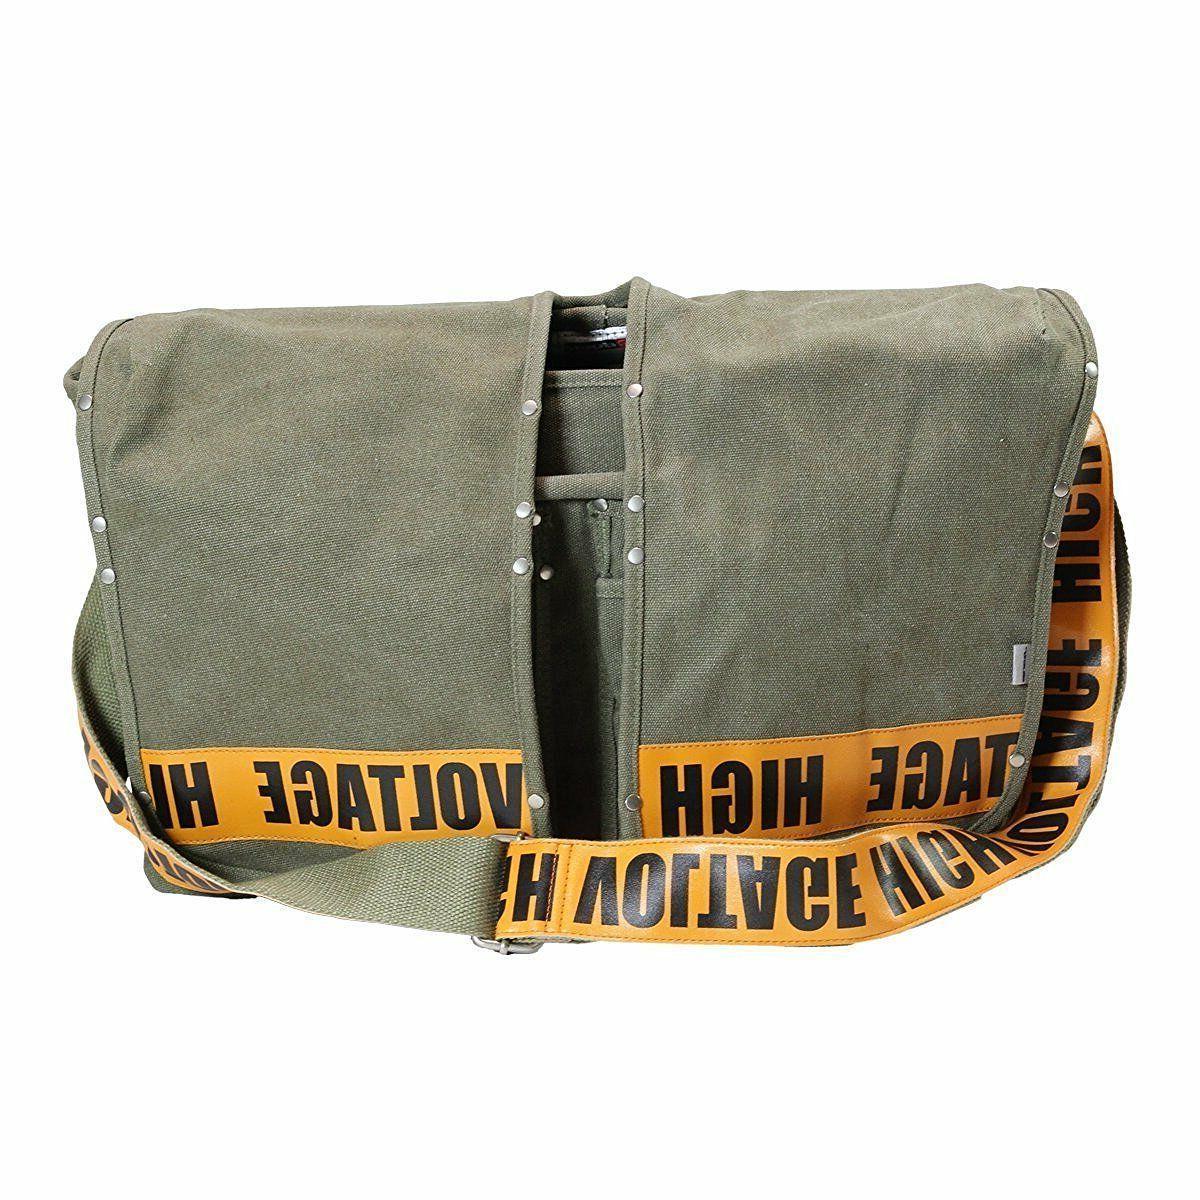 Ducti Laptop Messenger Bags - Utilitarian Electronics Access